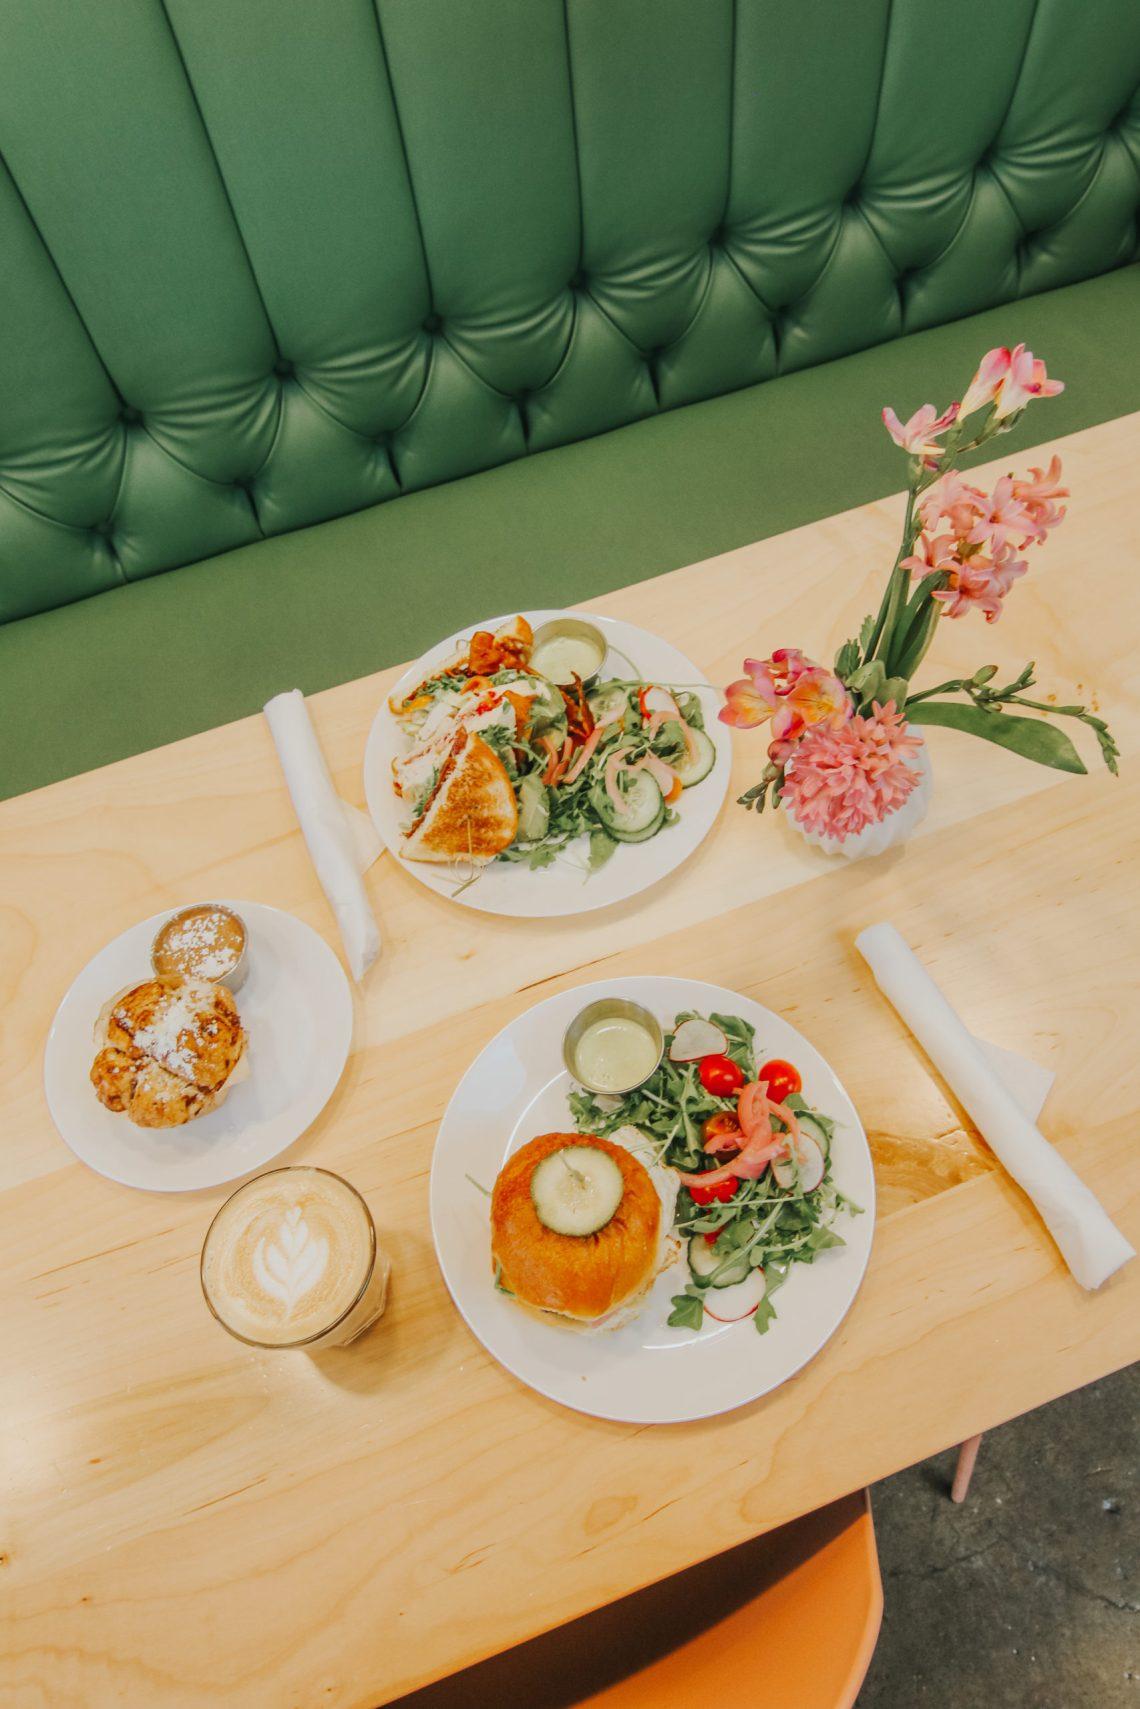 Edge Alley, restaurant, Memphis restaurant, cafe, Memphis, Tennessee, Memphis Travel Guide, travel guide, The Best Instagram Spots in Memphis, travel, The Urban Darling, blog, blogger.